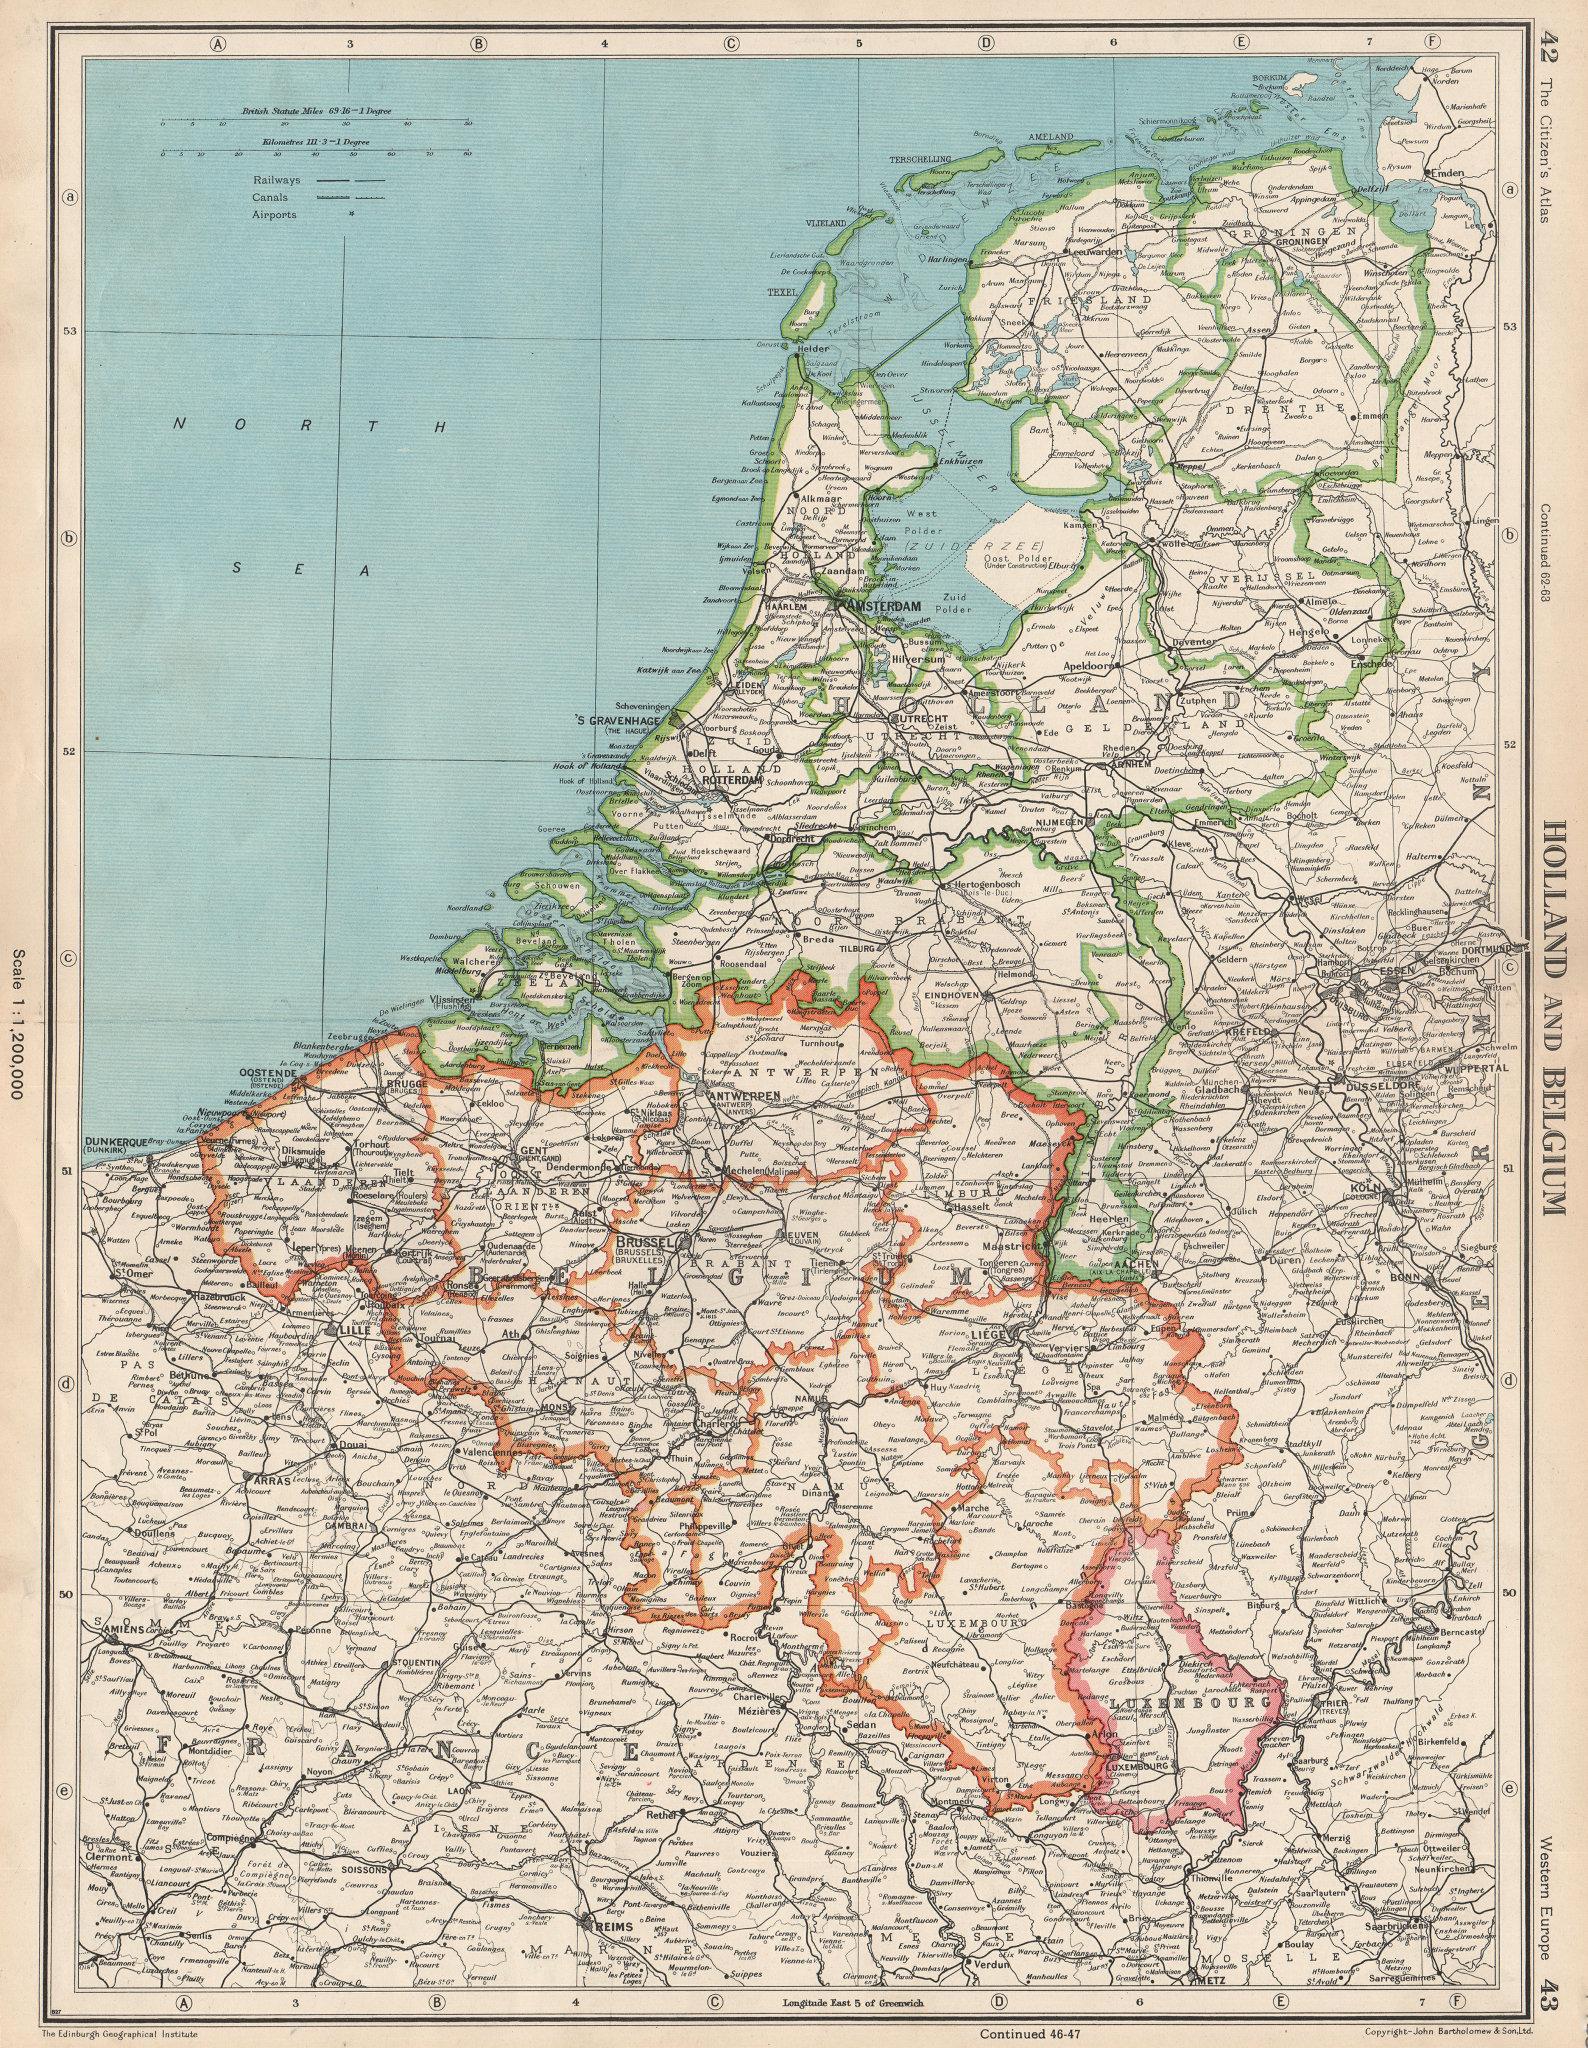 Associate Product BENELUX. Netherlands shows Oost Polder (Flevopolder) under construction 1952 map